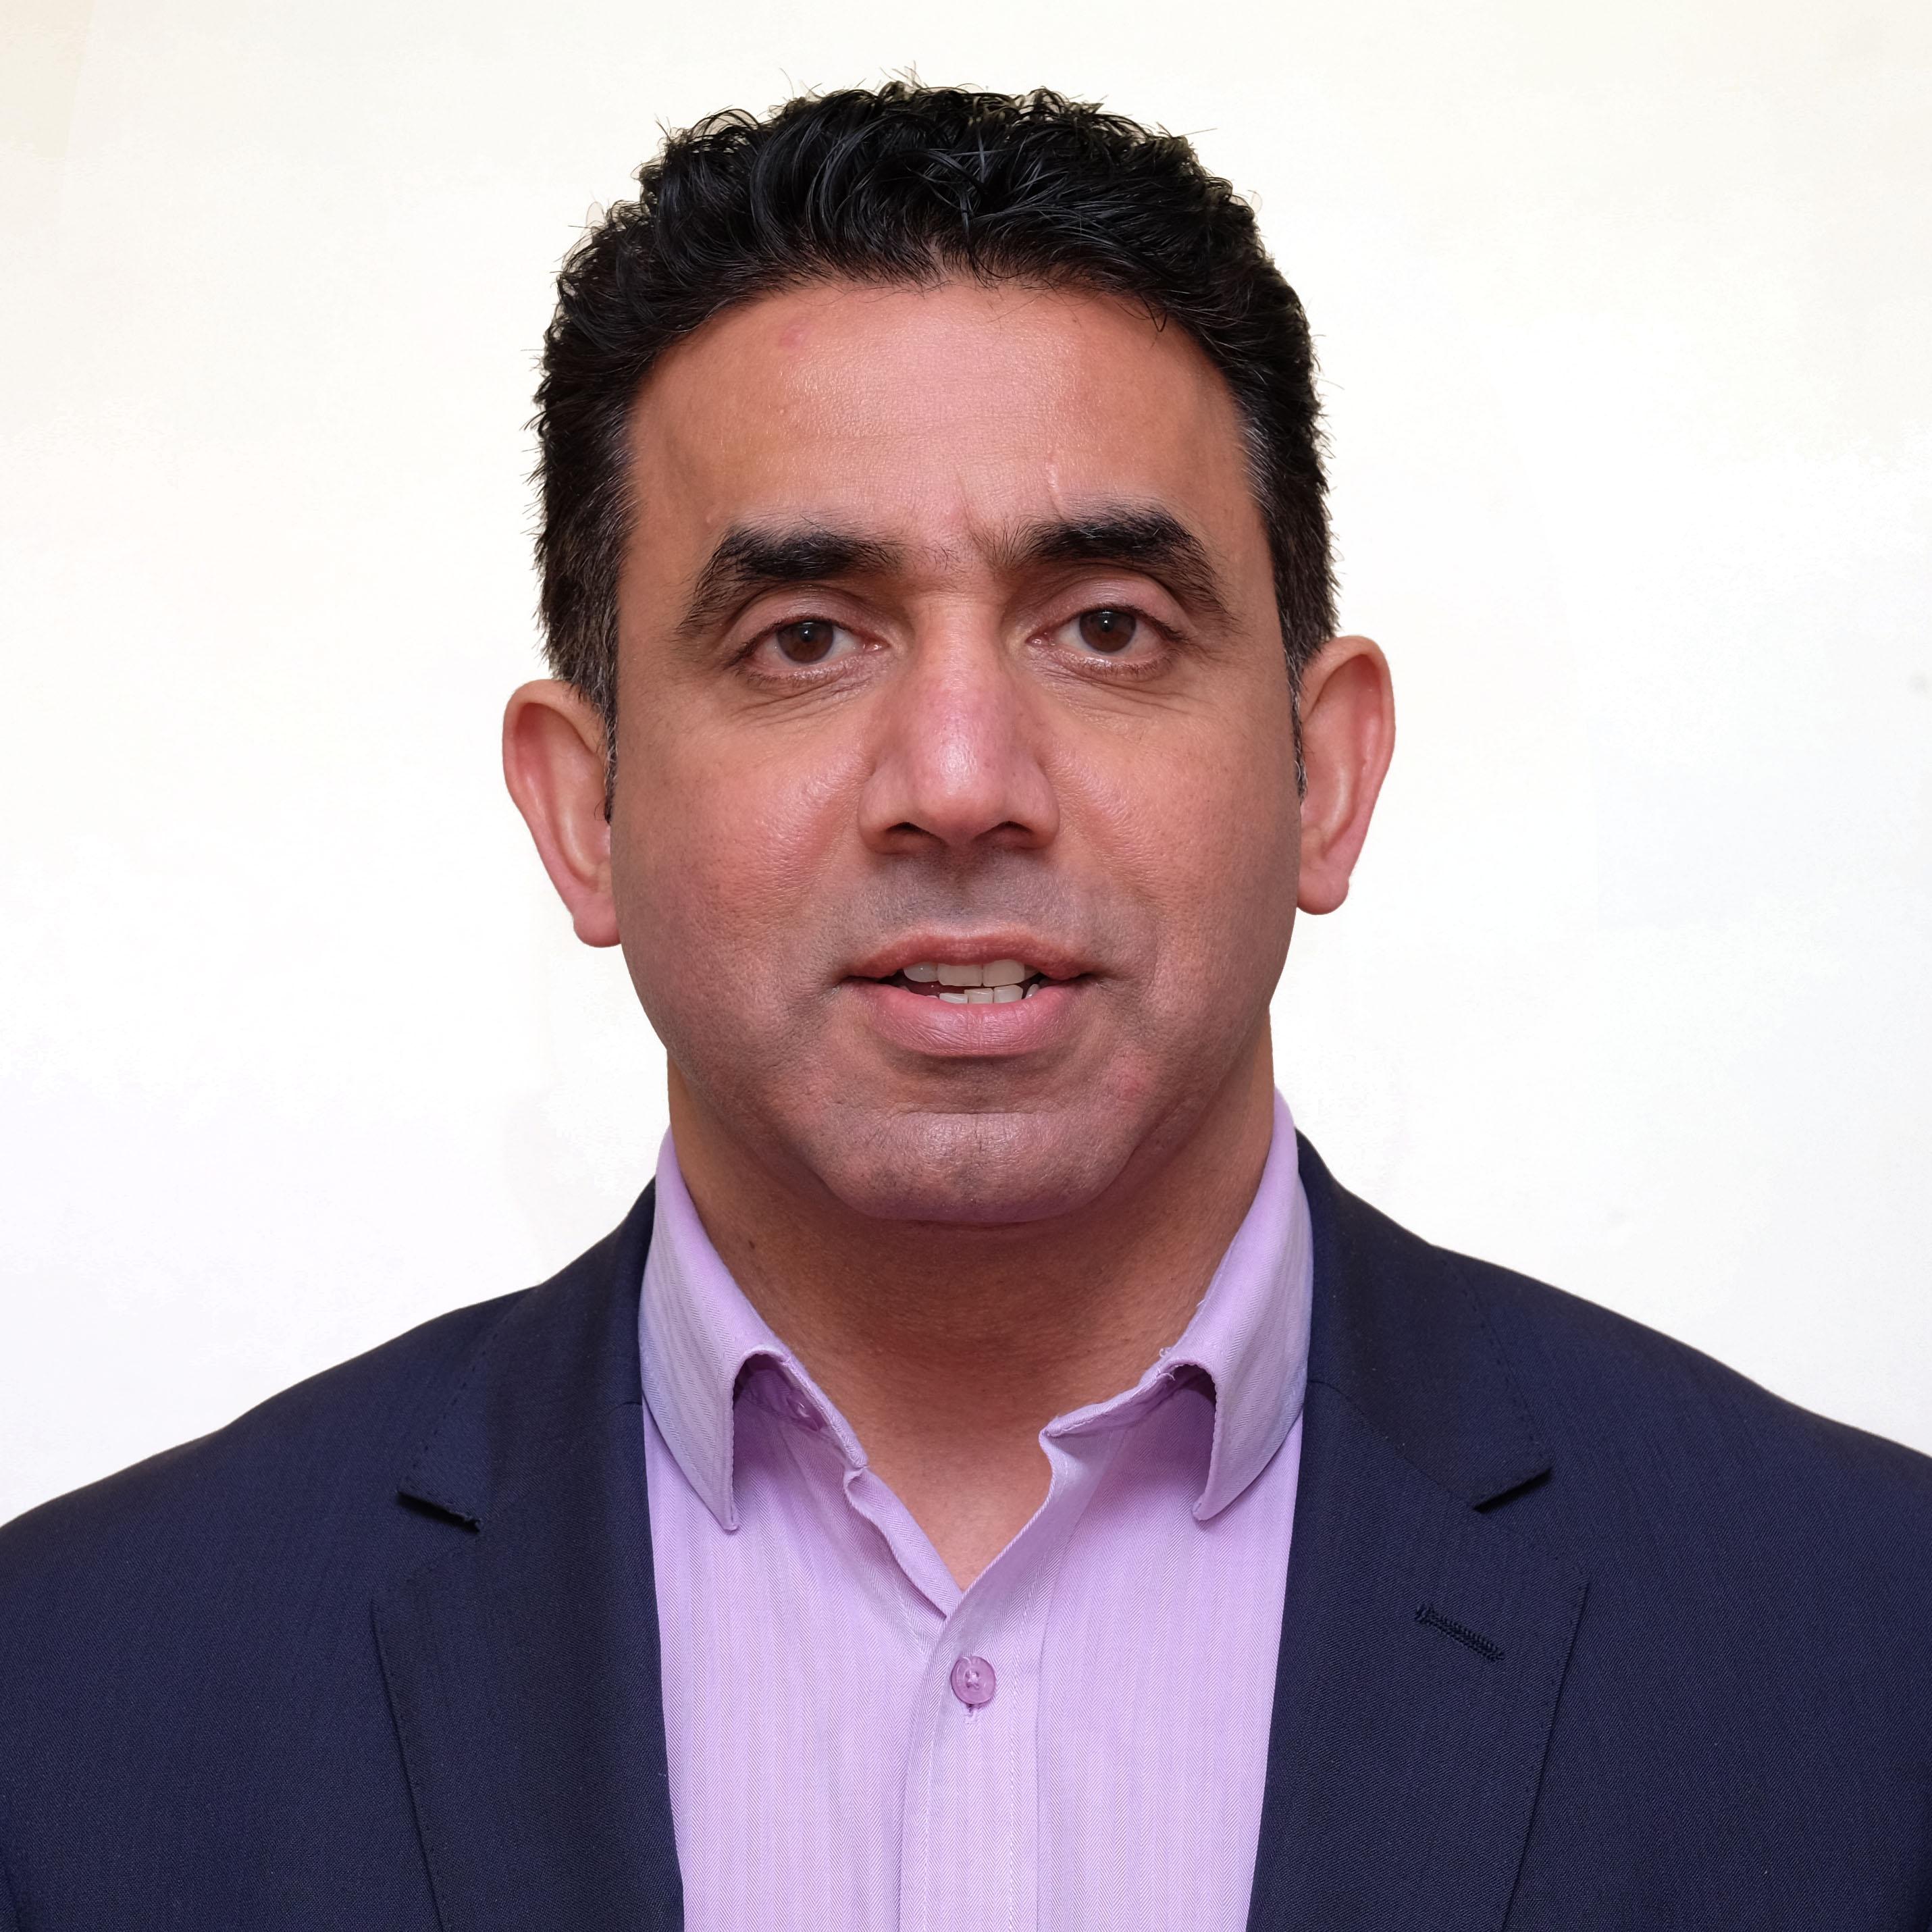 Mahroof Hussain